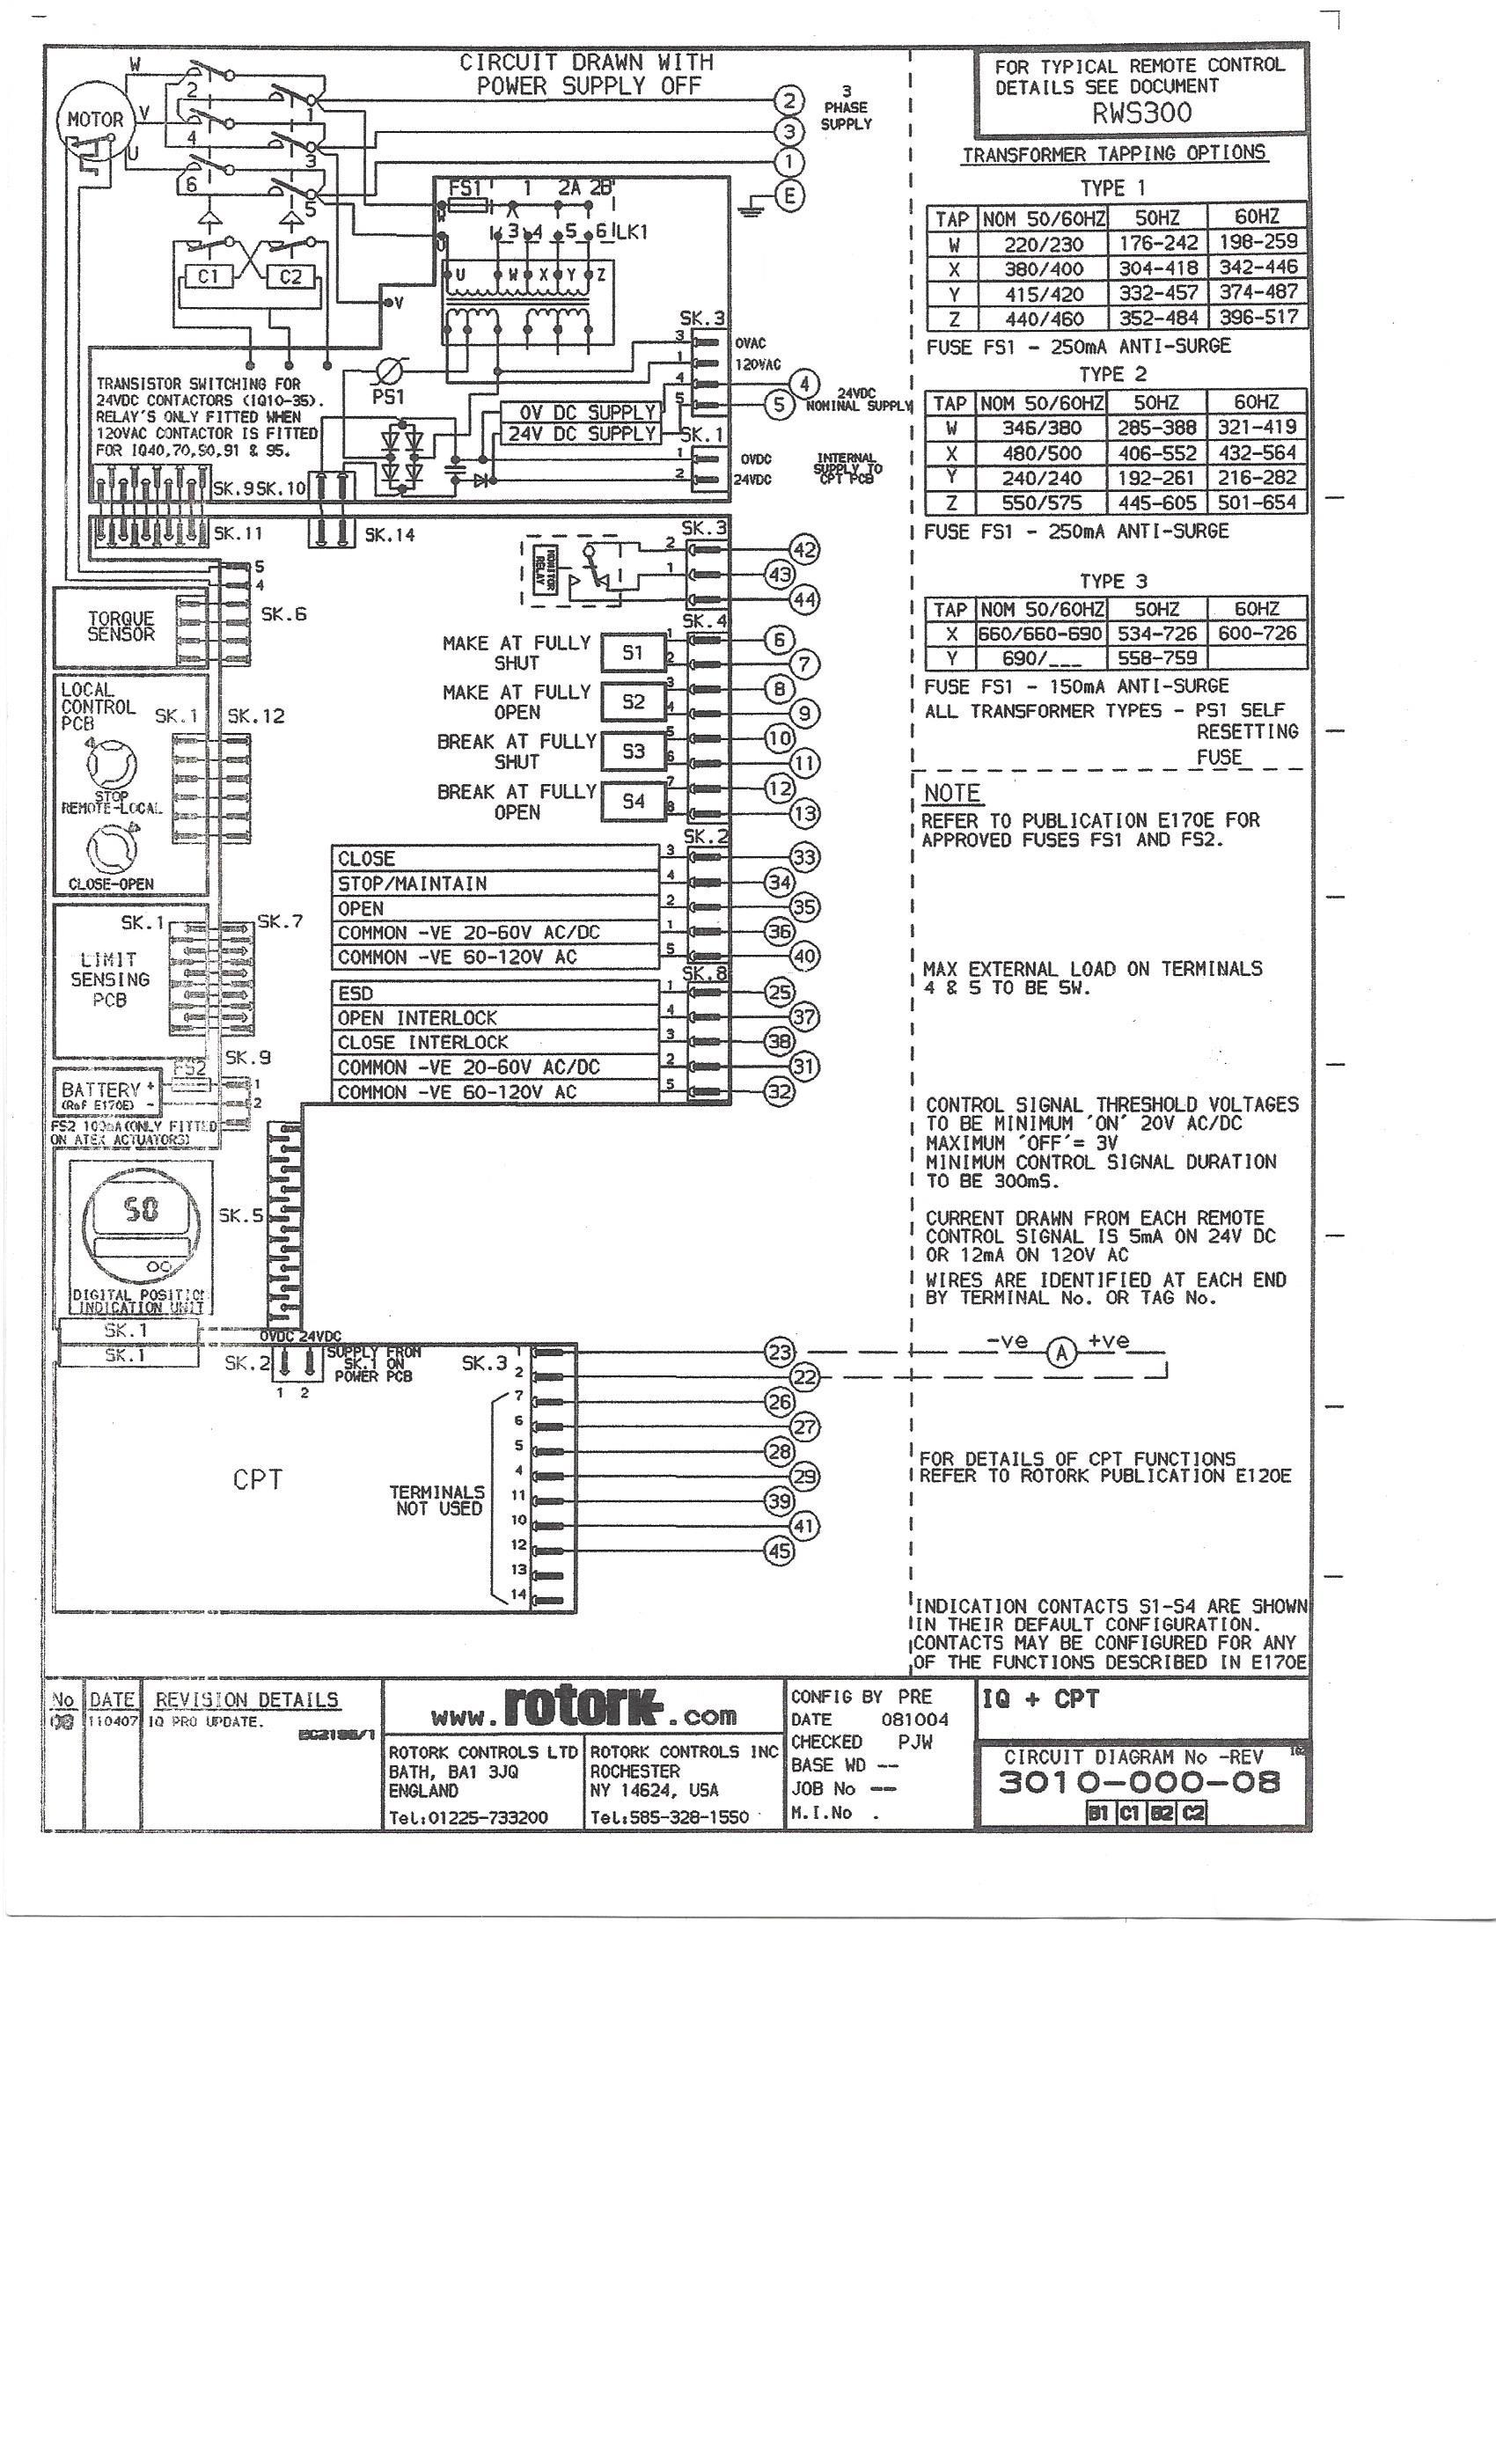 limitorque qx wiring diagram westinghouse wiring diagrams www rh kotaksurat co limitorque qx-4 wiring diagram limitorque qx-5 wiring diagram